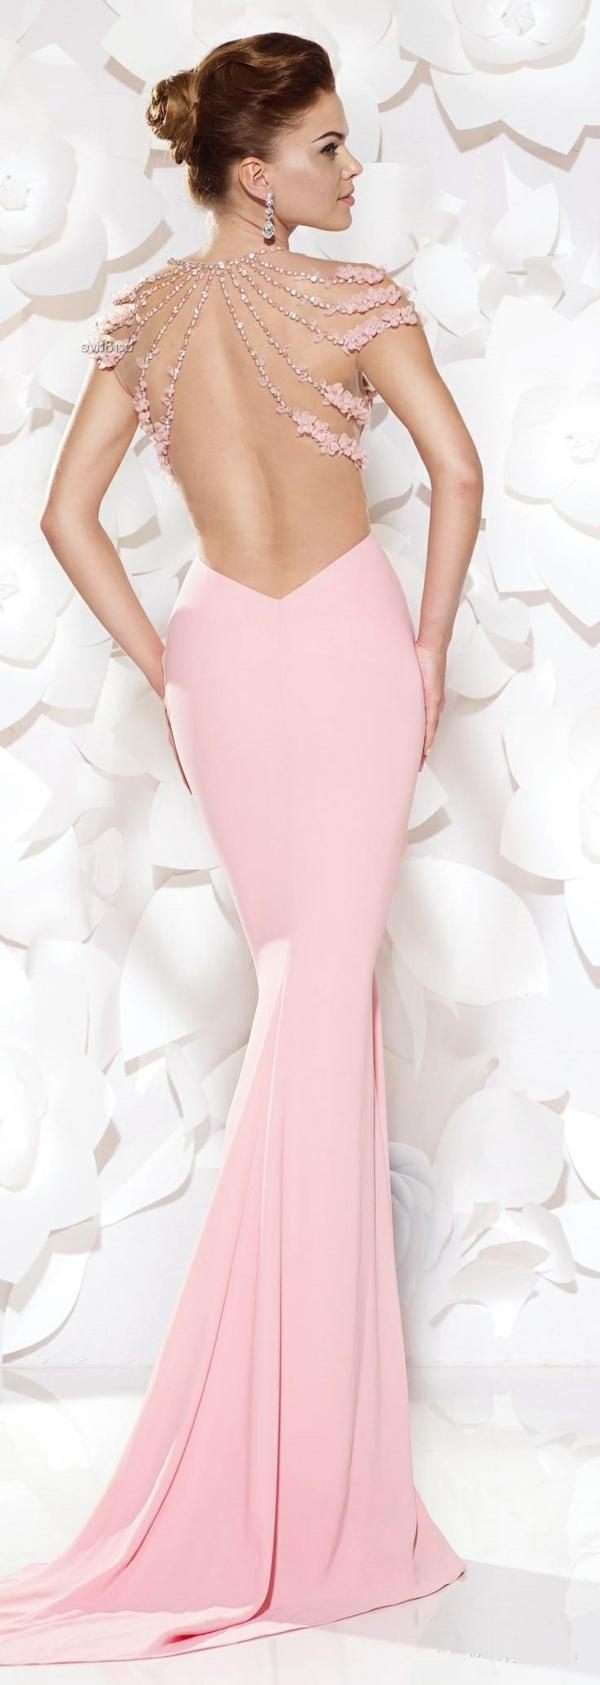 Robe-rose-bebe-de-mariée-élégante-